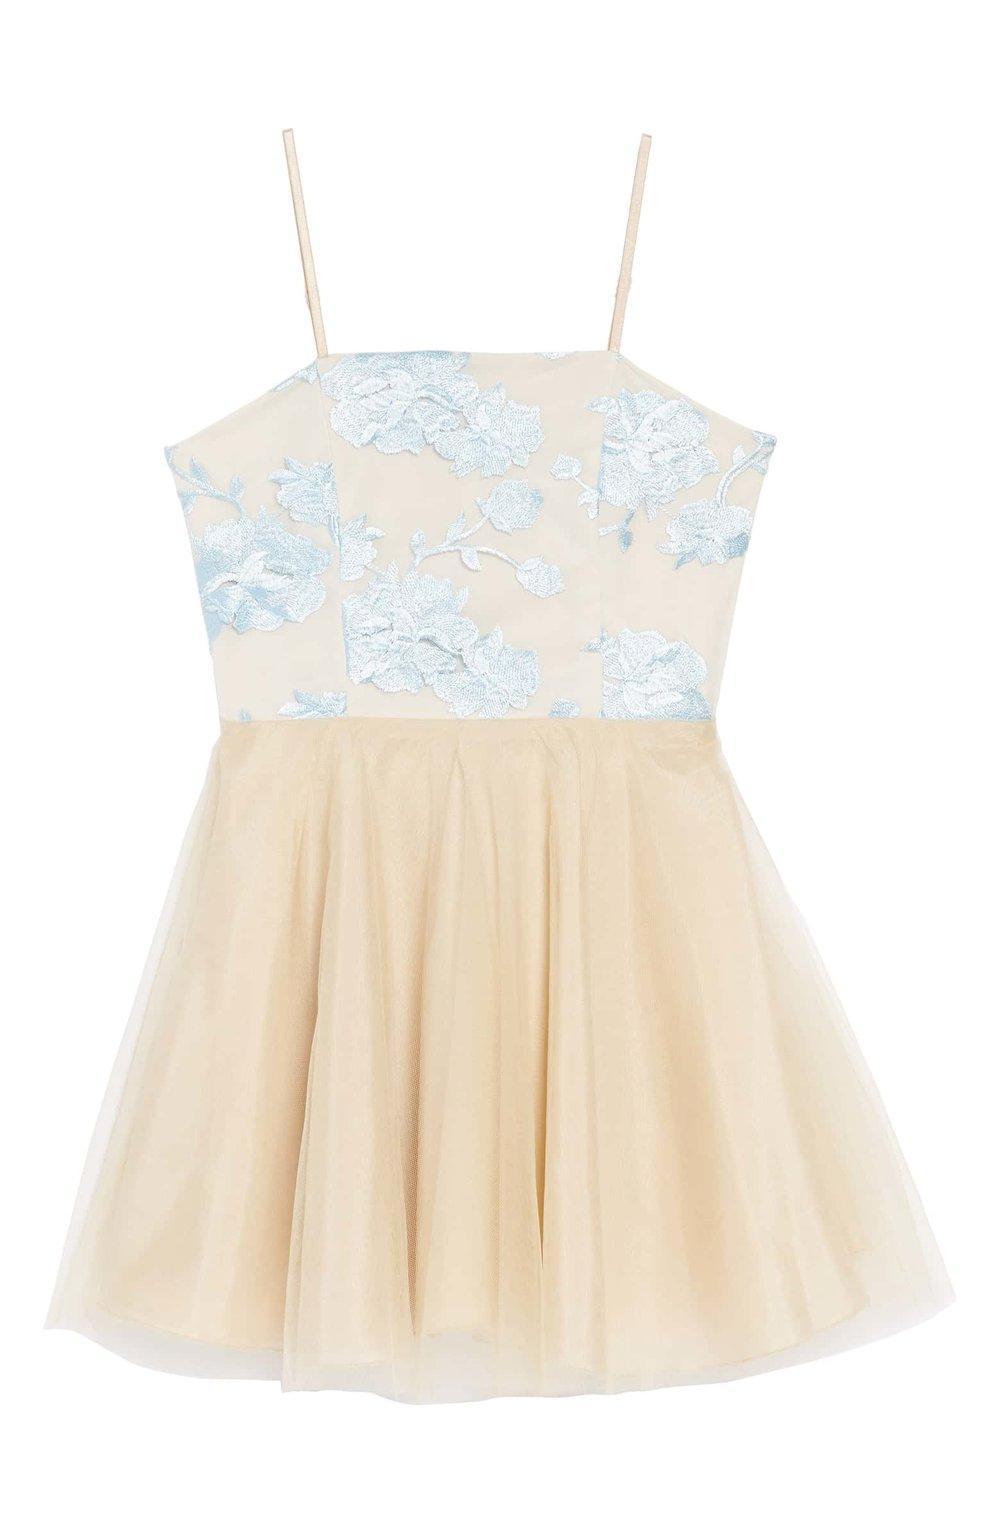 UN DEUX TROIS Floral Embroidered Tulle Dress | Nordstrom